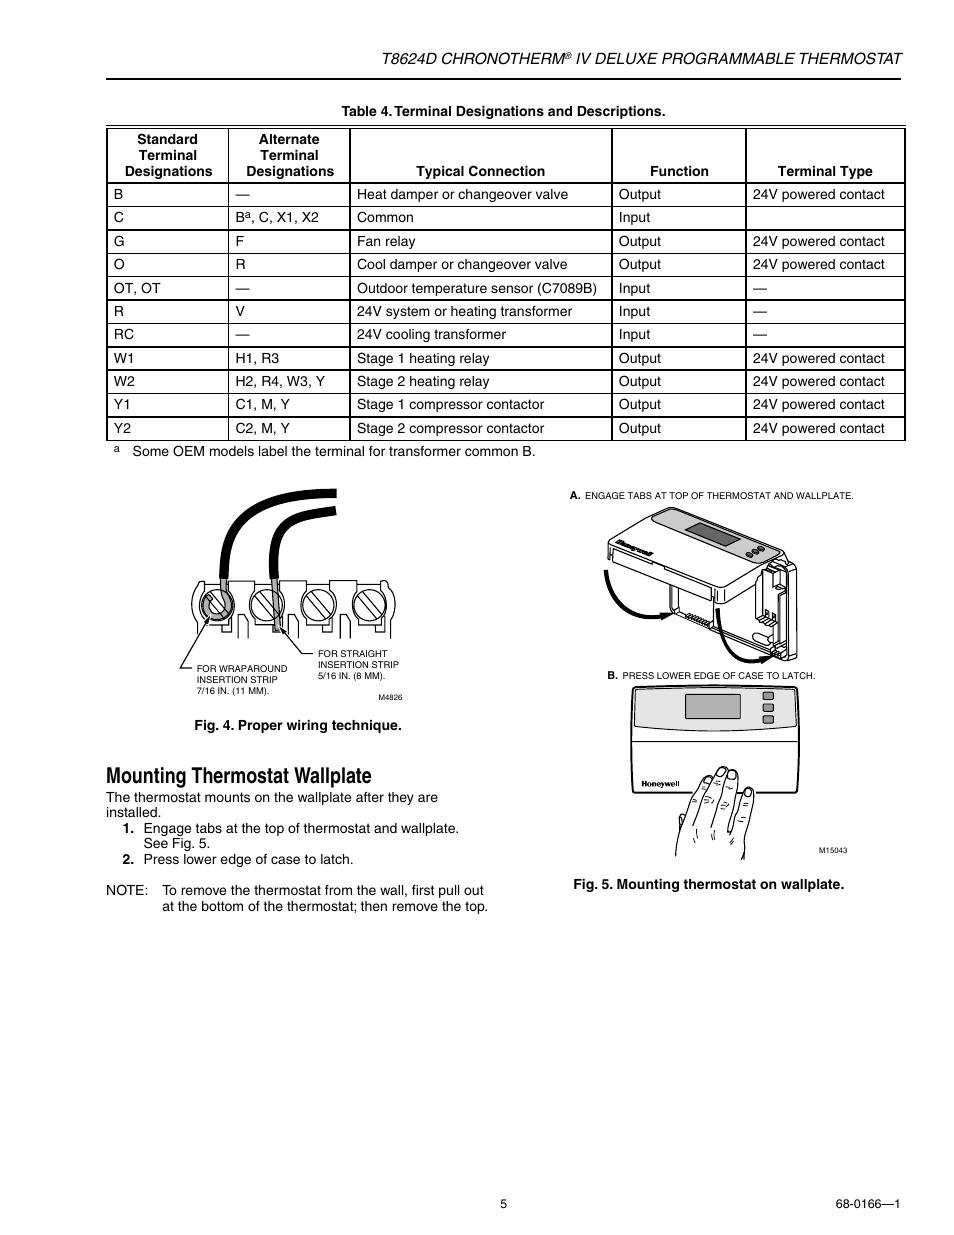 Wiring Diagram: 26 Honeywell Chronotherm Iv Plus Wiring